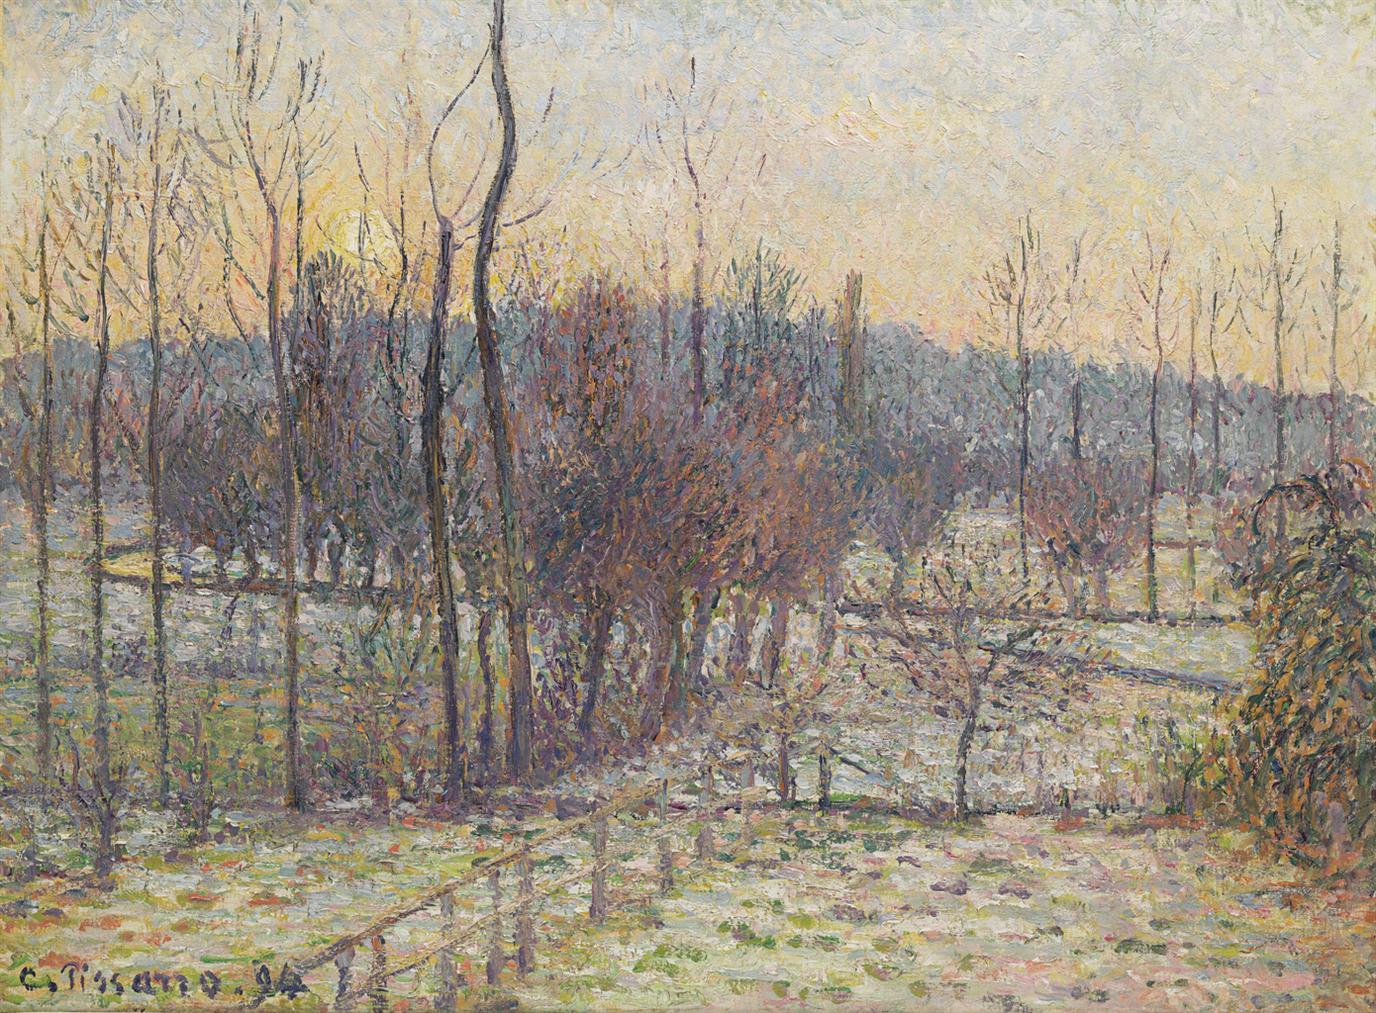 Camille Pissarro-Neige, Soleil Couchant, Eragny-1894